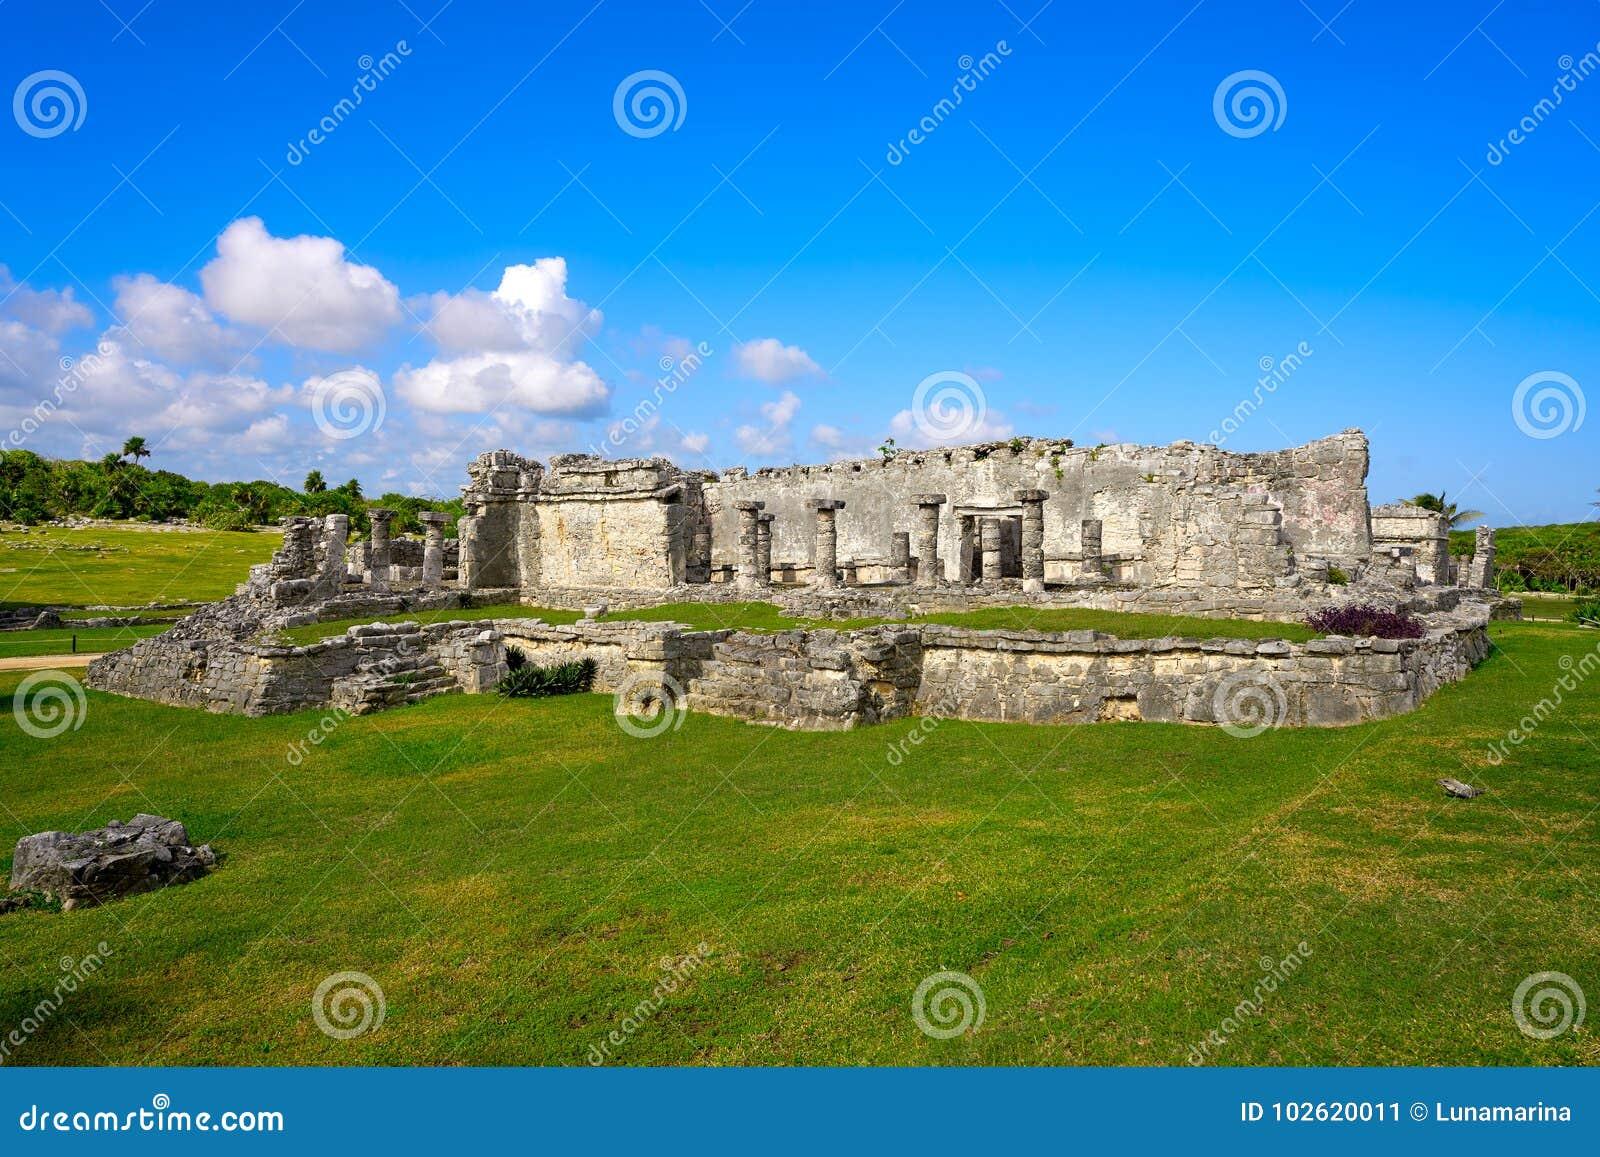 Ruïnes van de Tulum Mayan stad in Riviera Maya